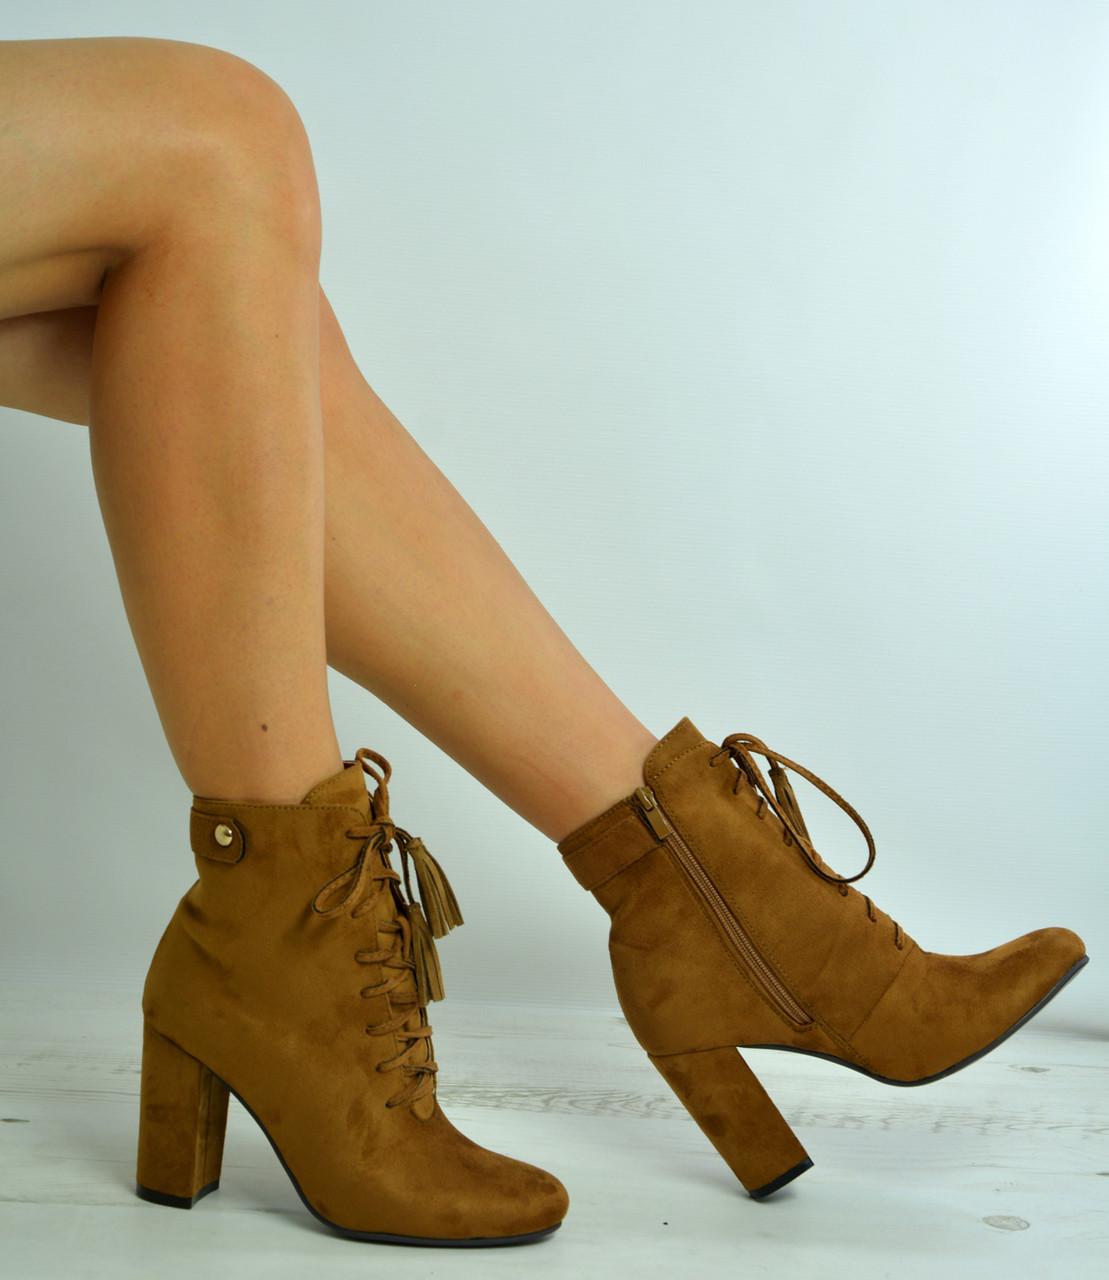 c306d38d57b9 Brand New Womens Ladies Block Heel Ankle Boots Lace Up Fringe Tassel Zip  Shoes Size Uk 3-8